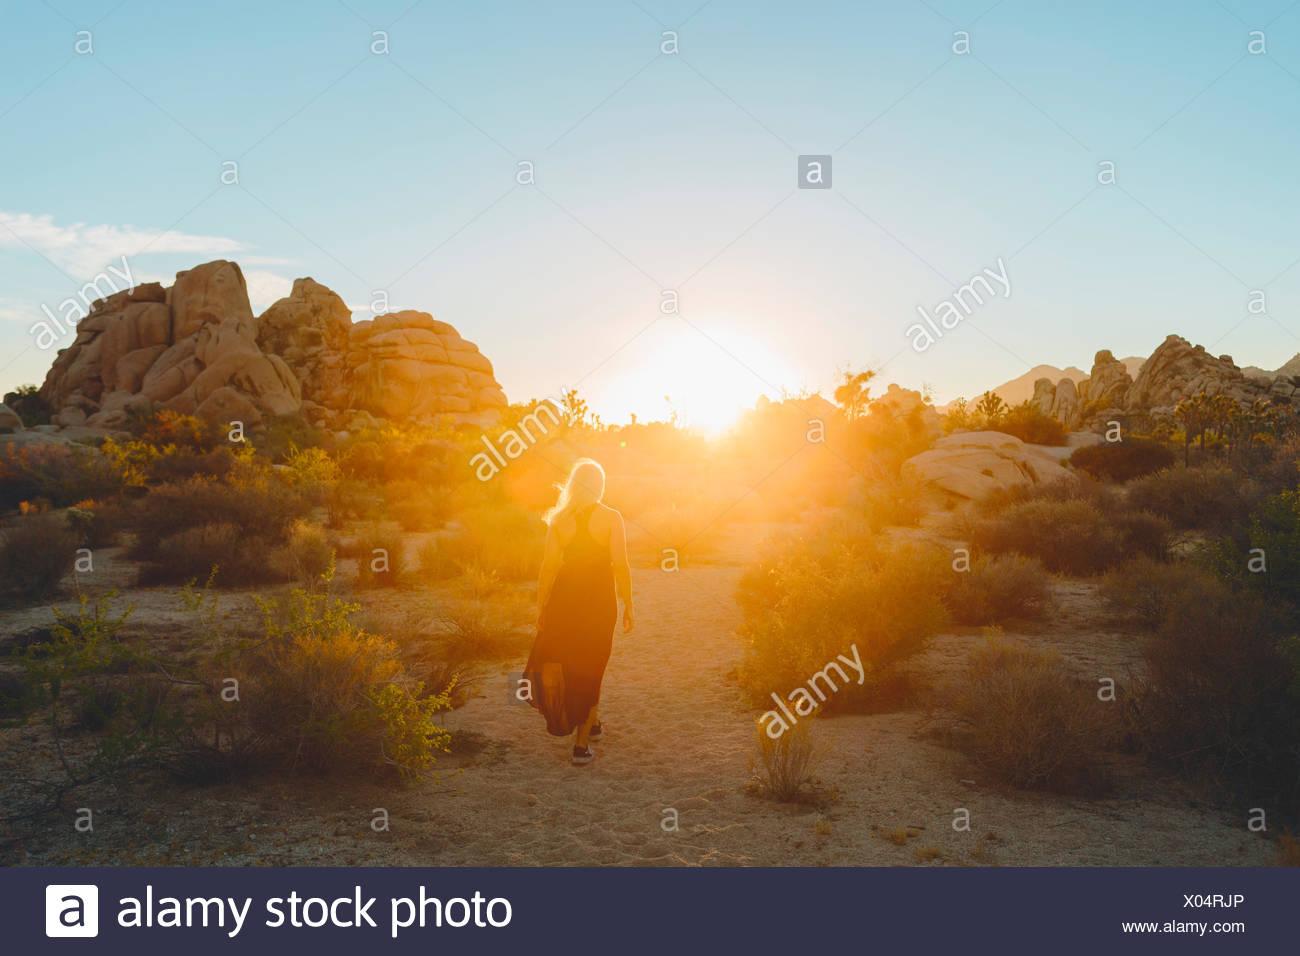 USA, California, Joshua Tree National Park, Woman wearing dress hiking at sunset Stock Photo